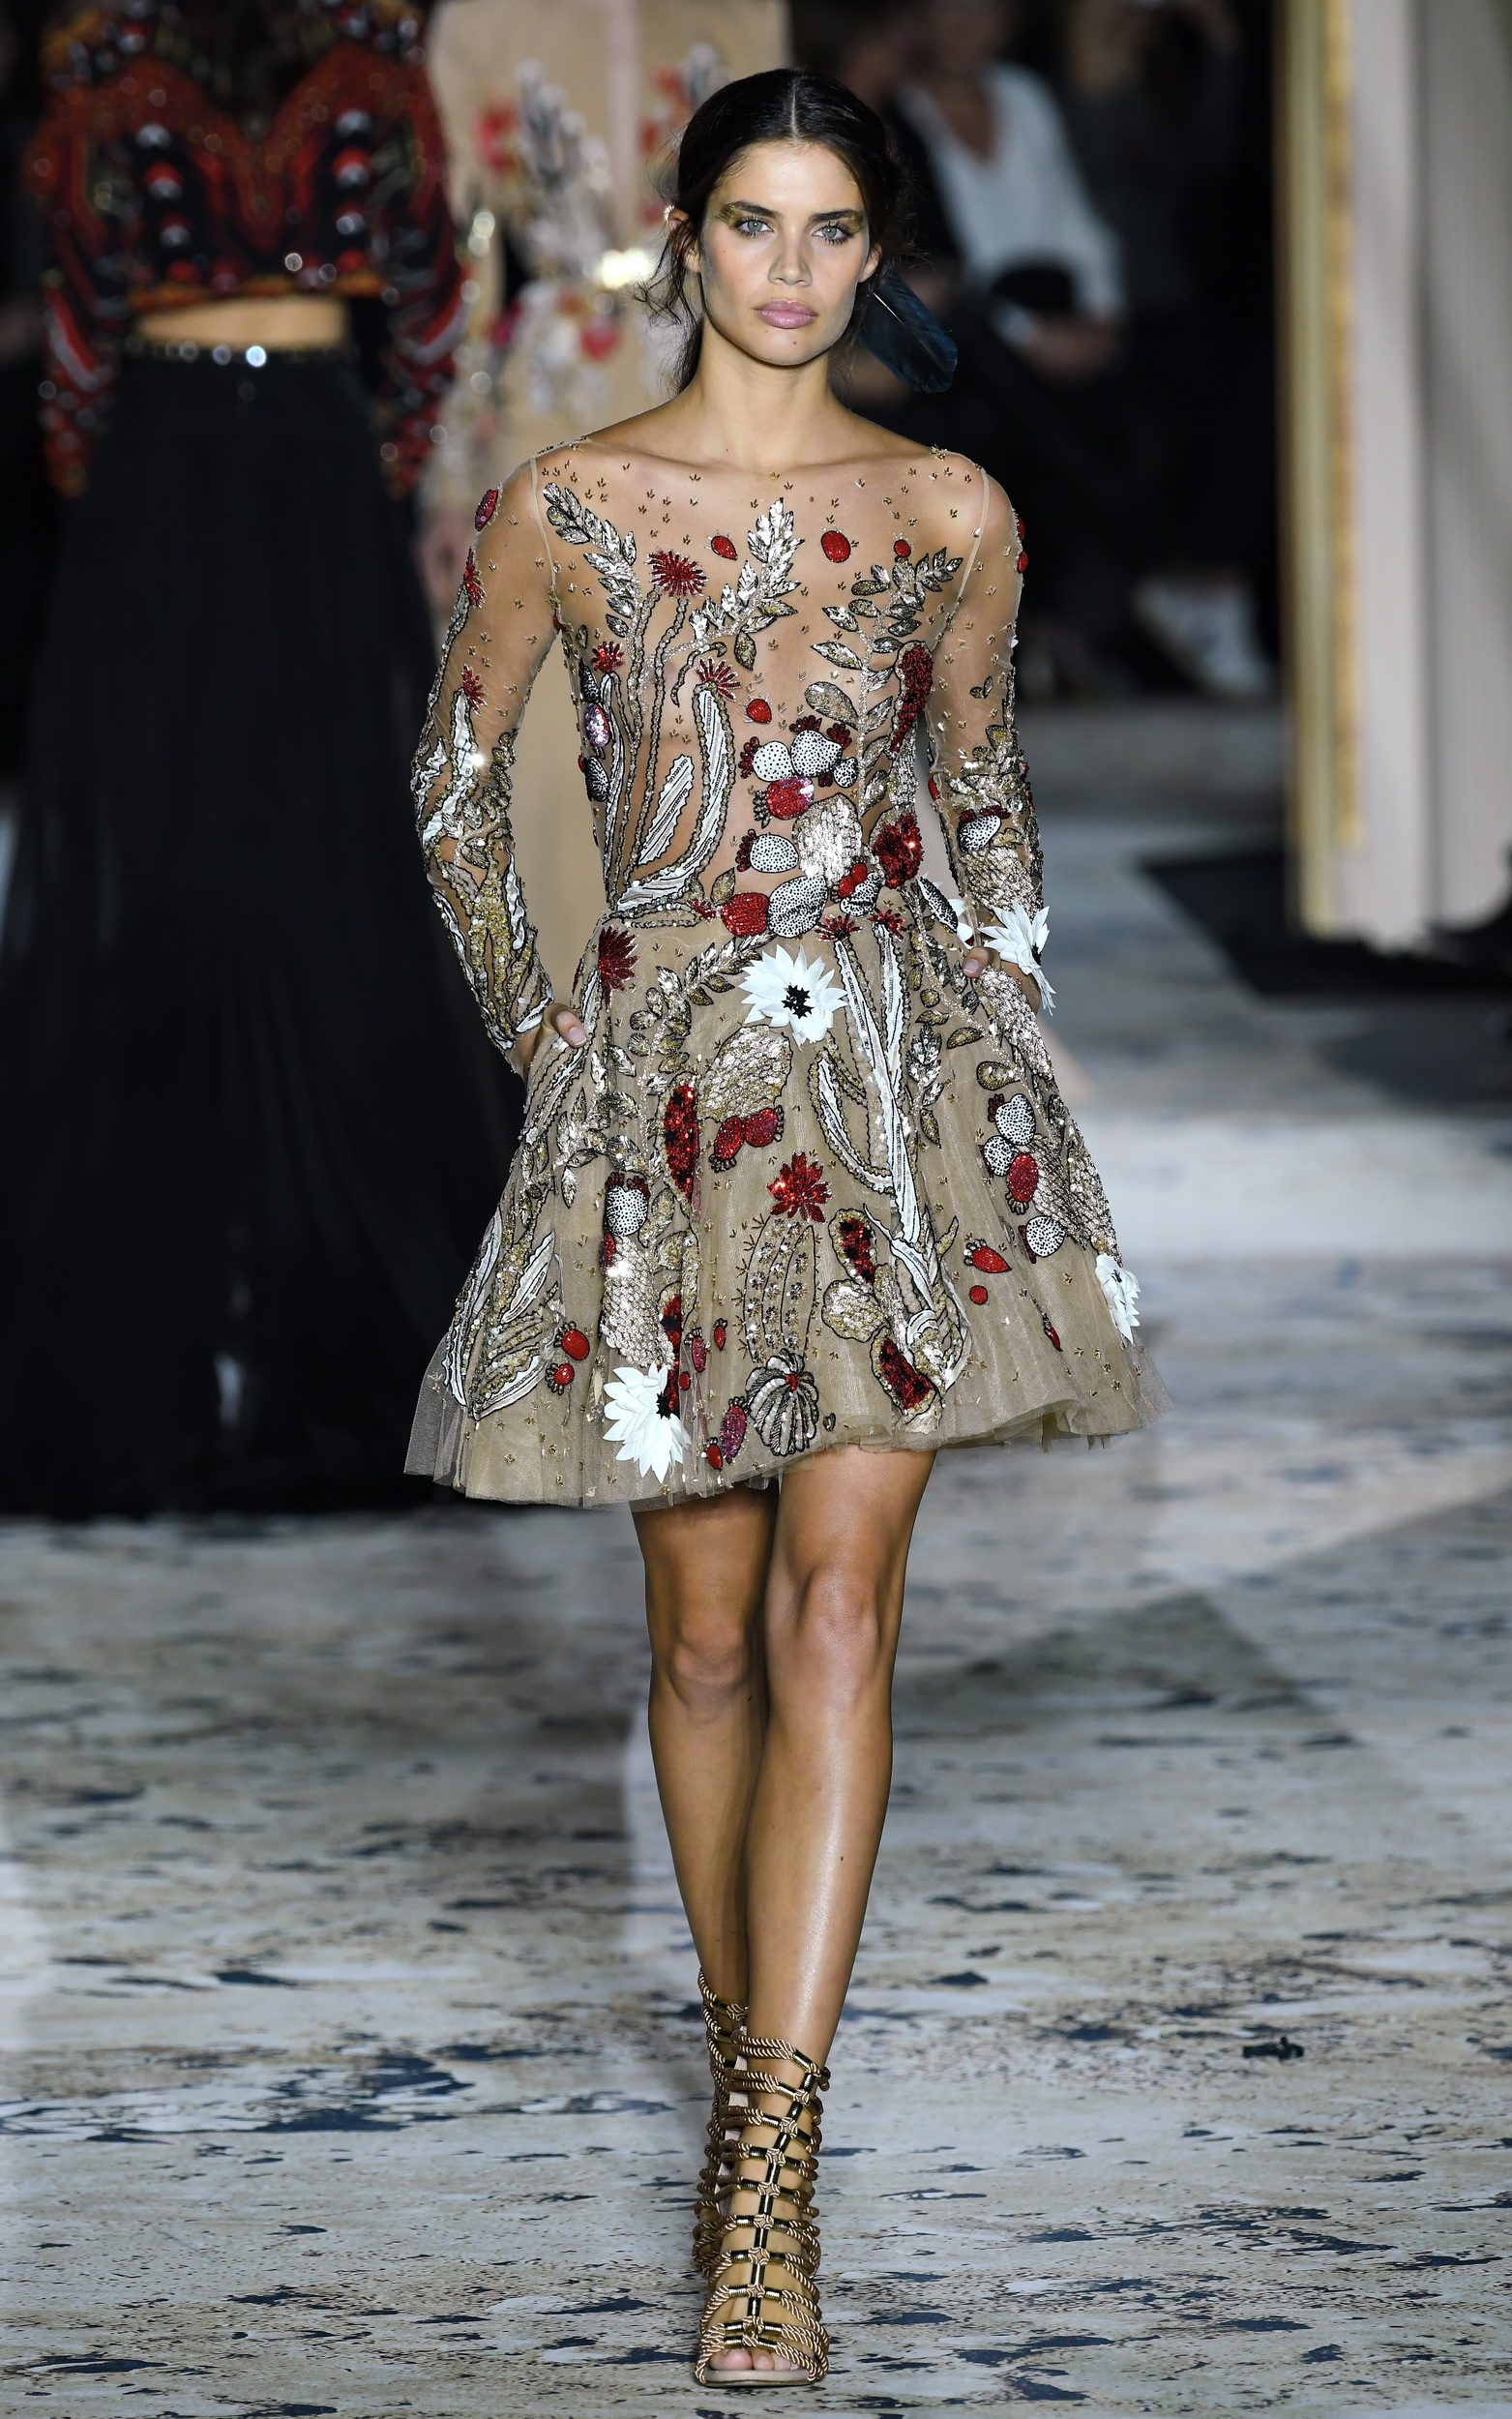 Paris Haute Couture SS 2018 Zuhair Murad 4to4u Arthur Koff 6.JPG